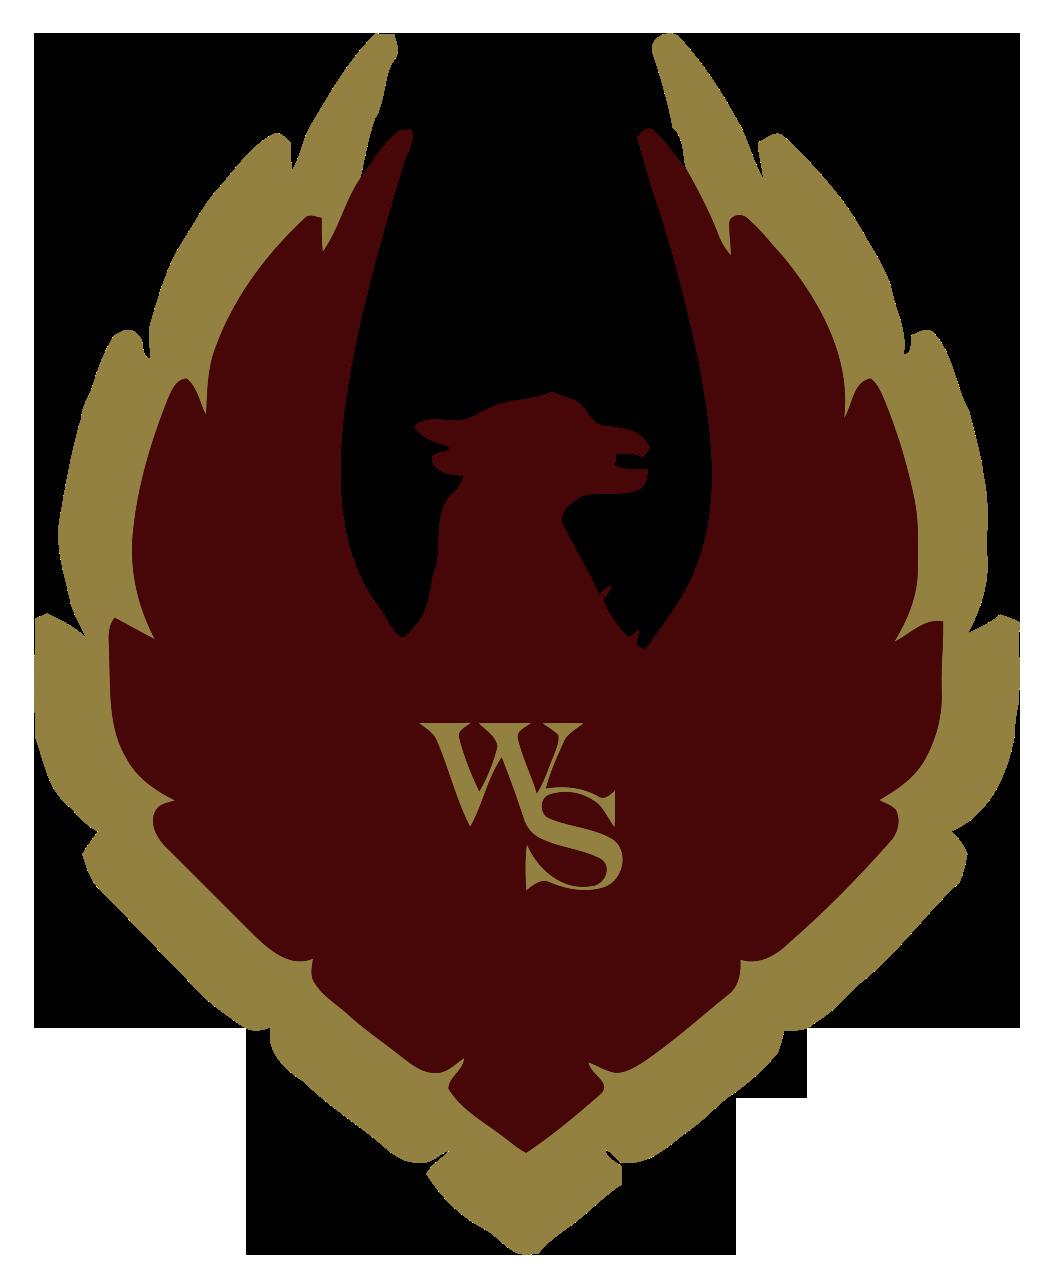 wsts logo